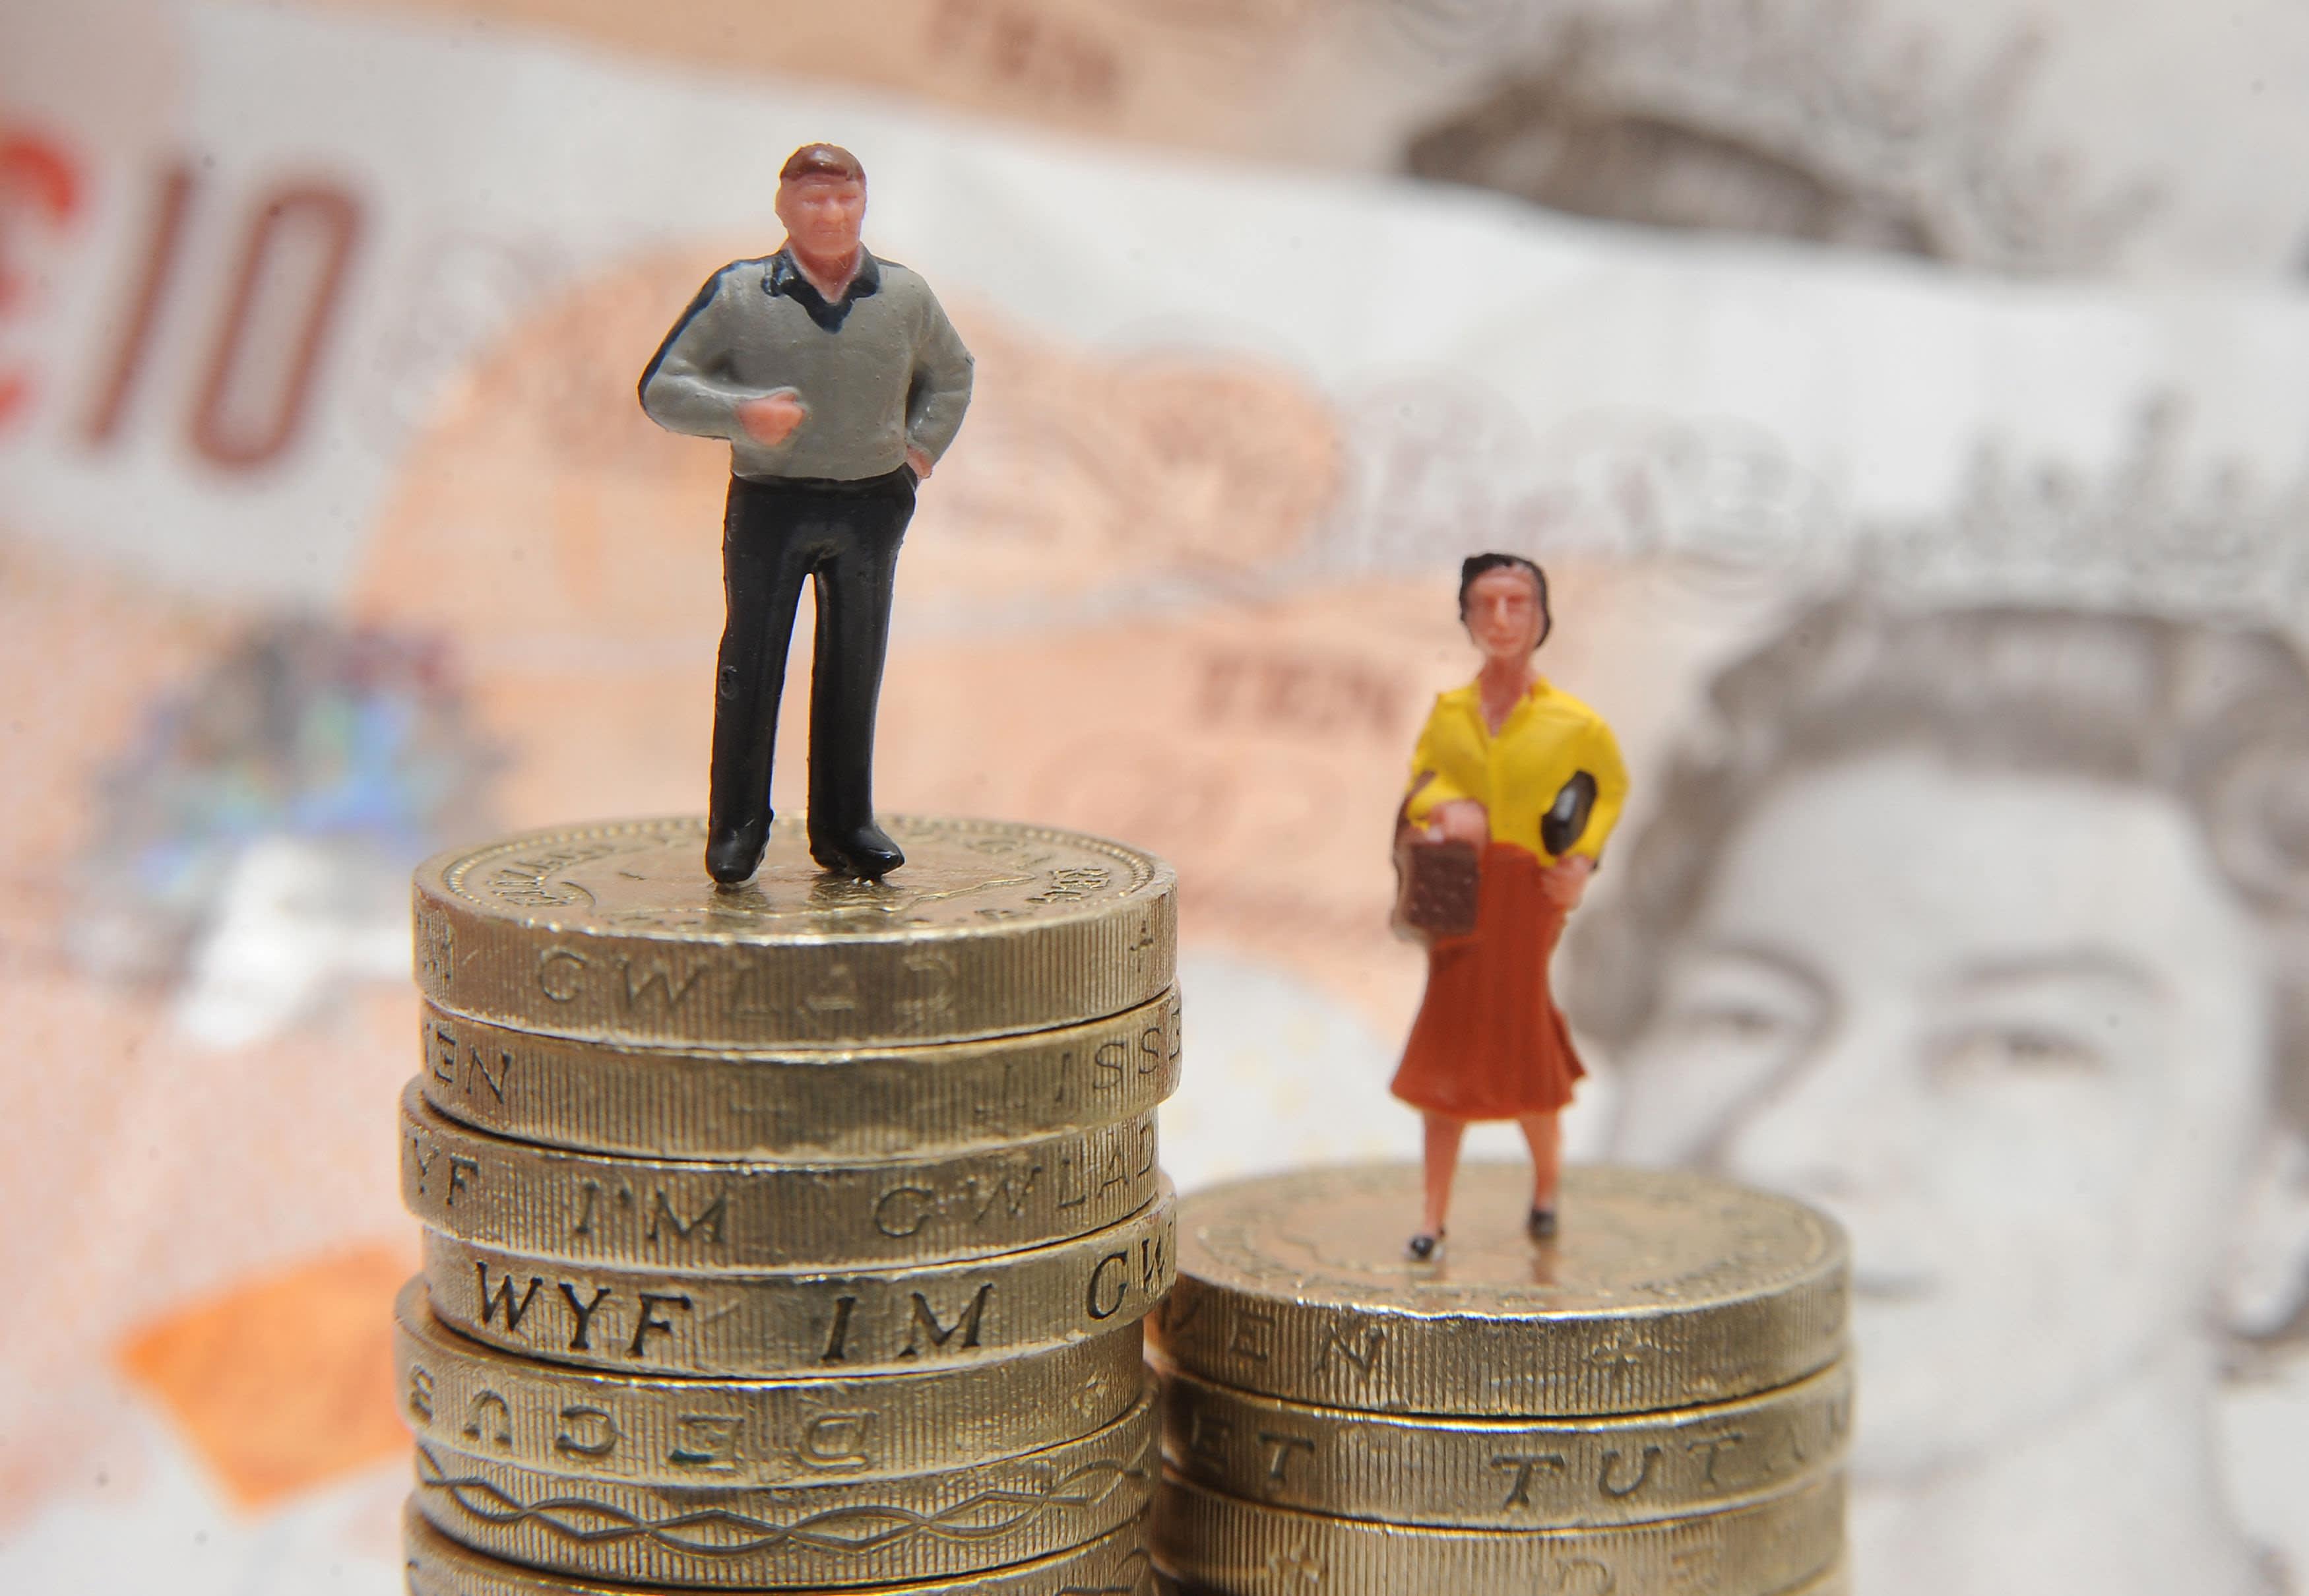 Auto-enrolment gender gap increases 40%